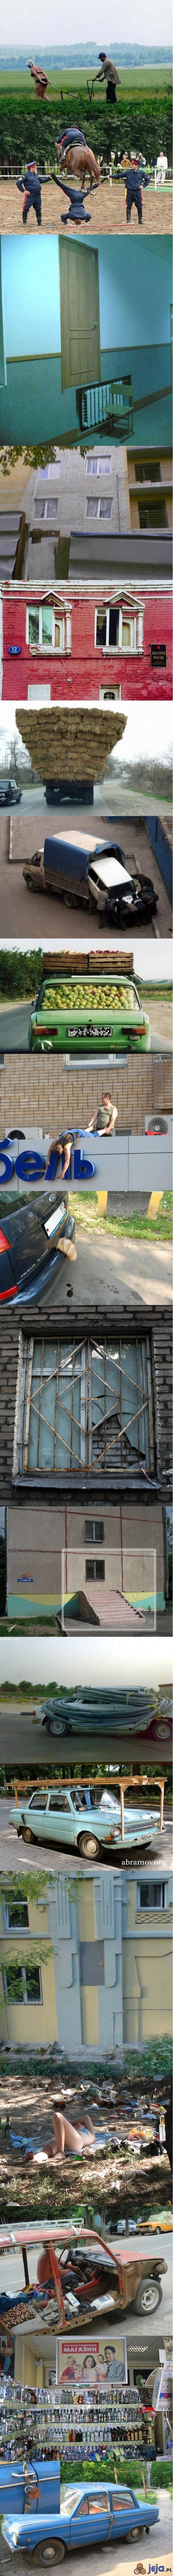 Prosto z Rosji